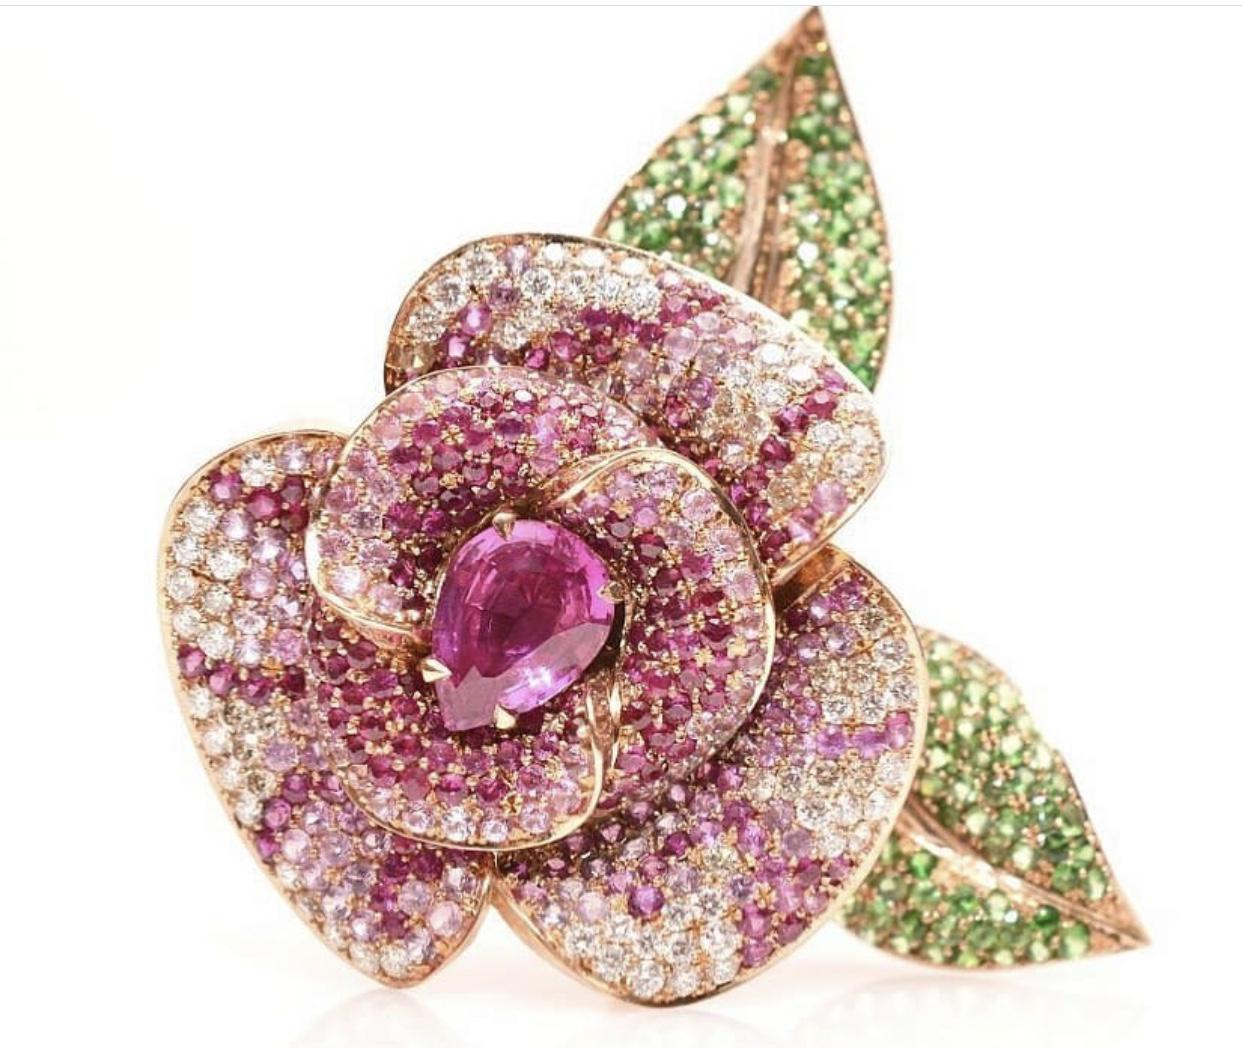 Fine jewelry PR in NYC